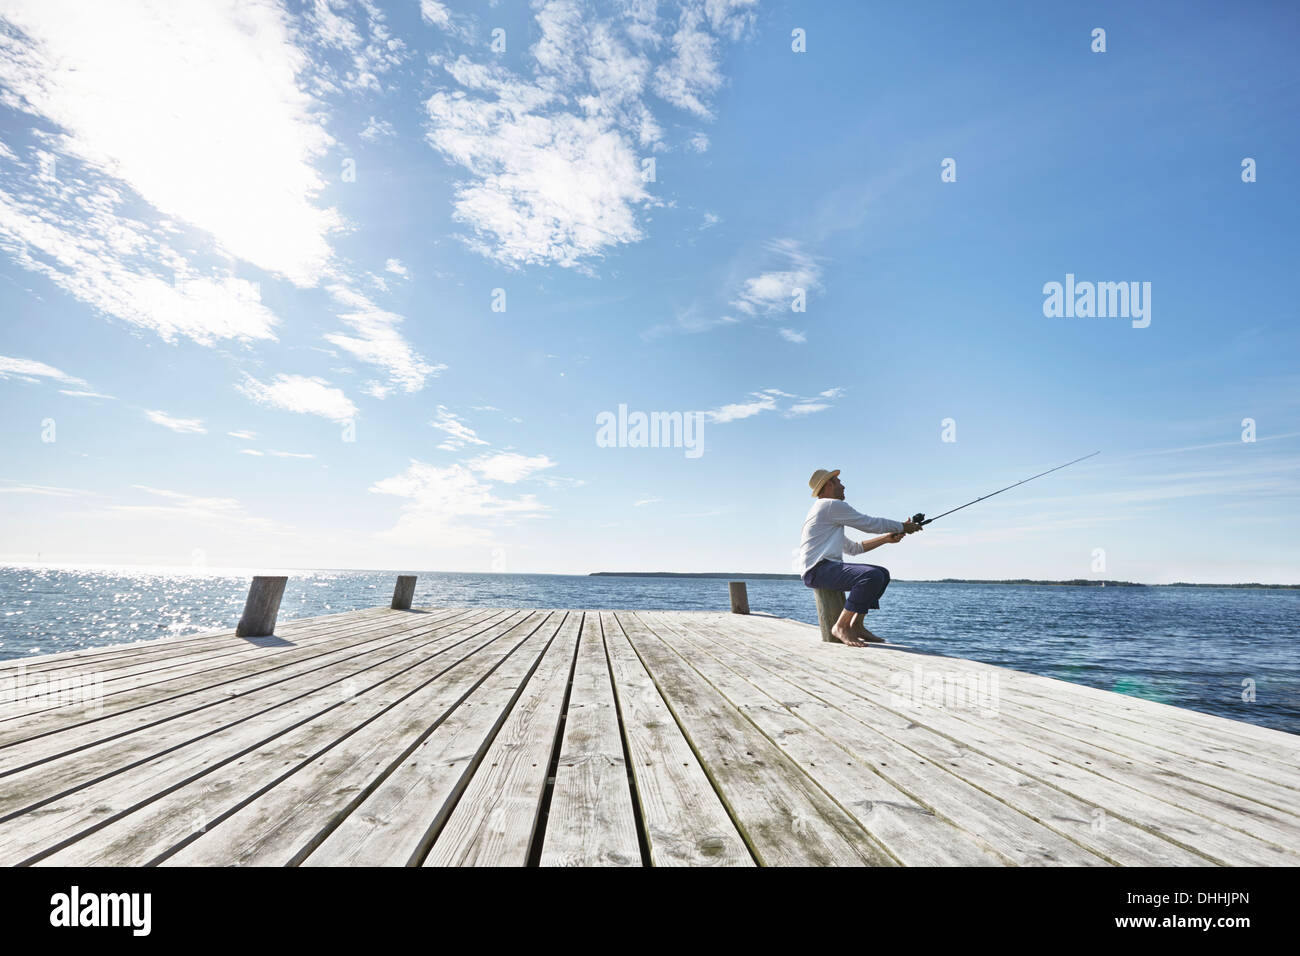 Mid adult man fishing off pier, Utvalnas, Sweden - Stock Image